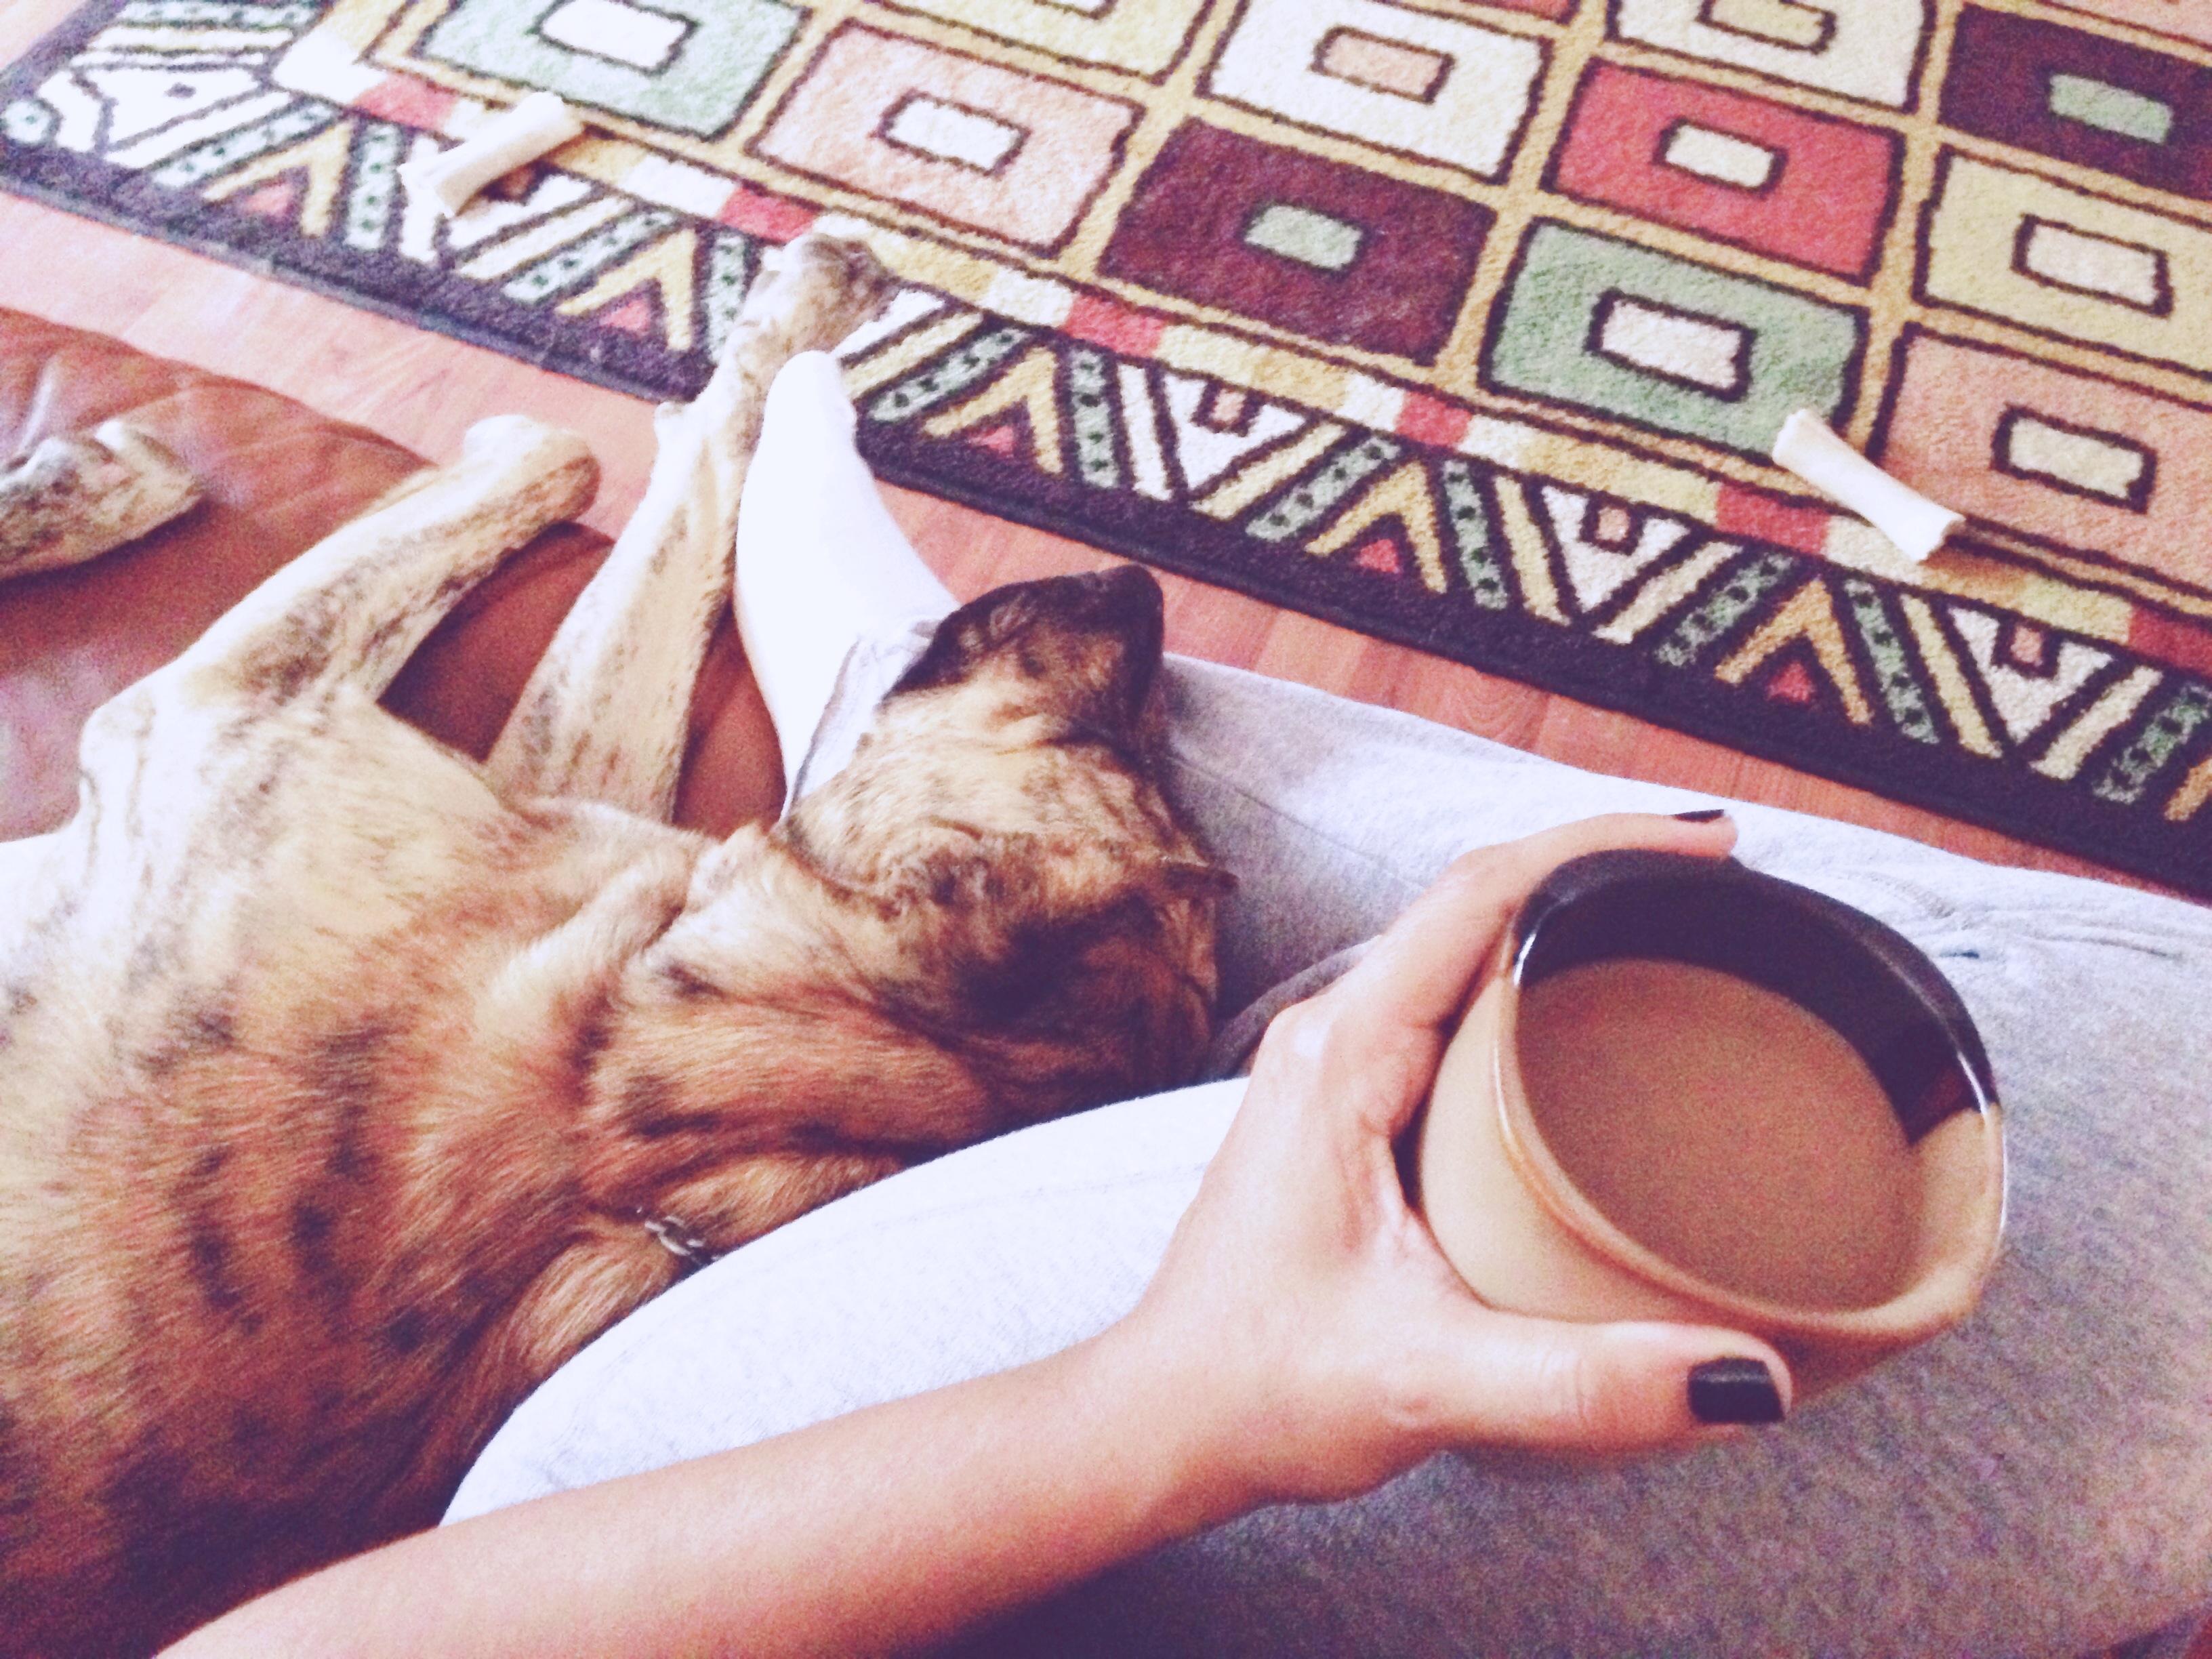 tituscoffee